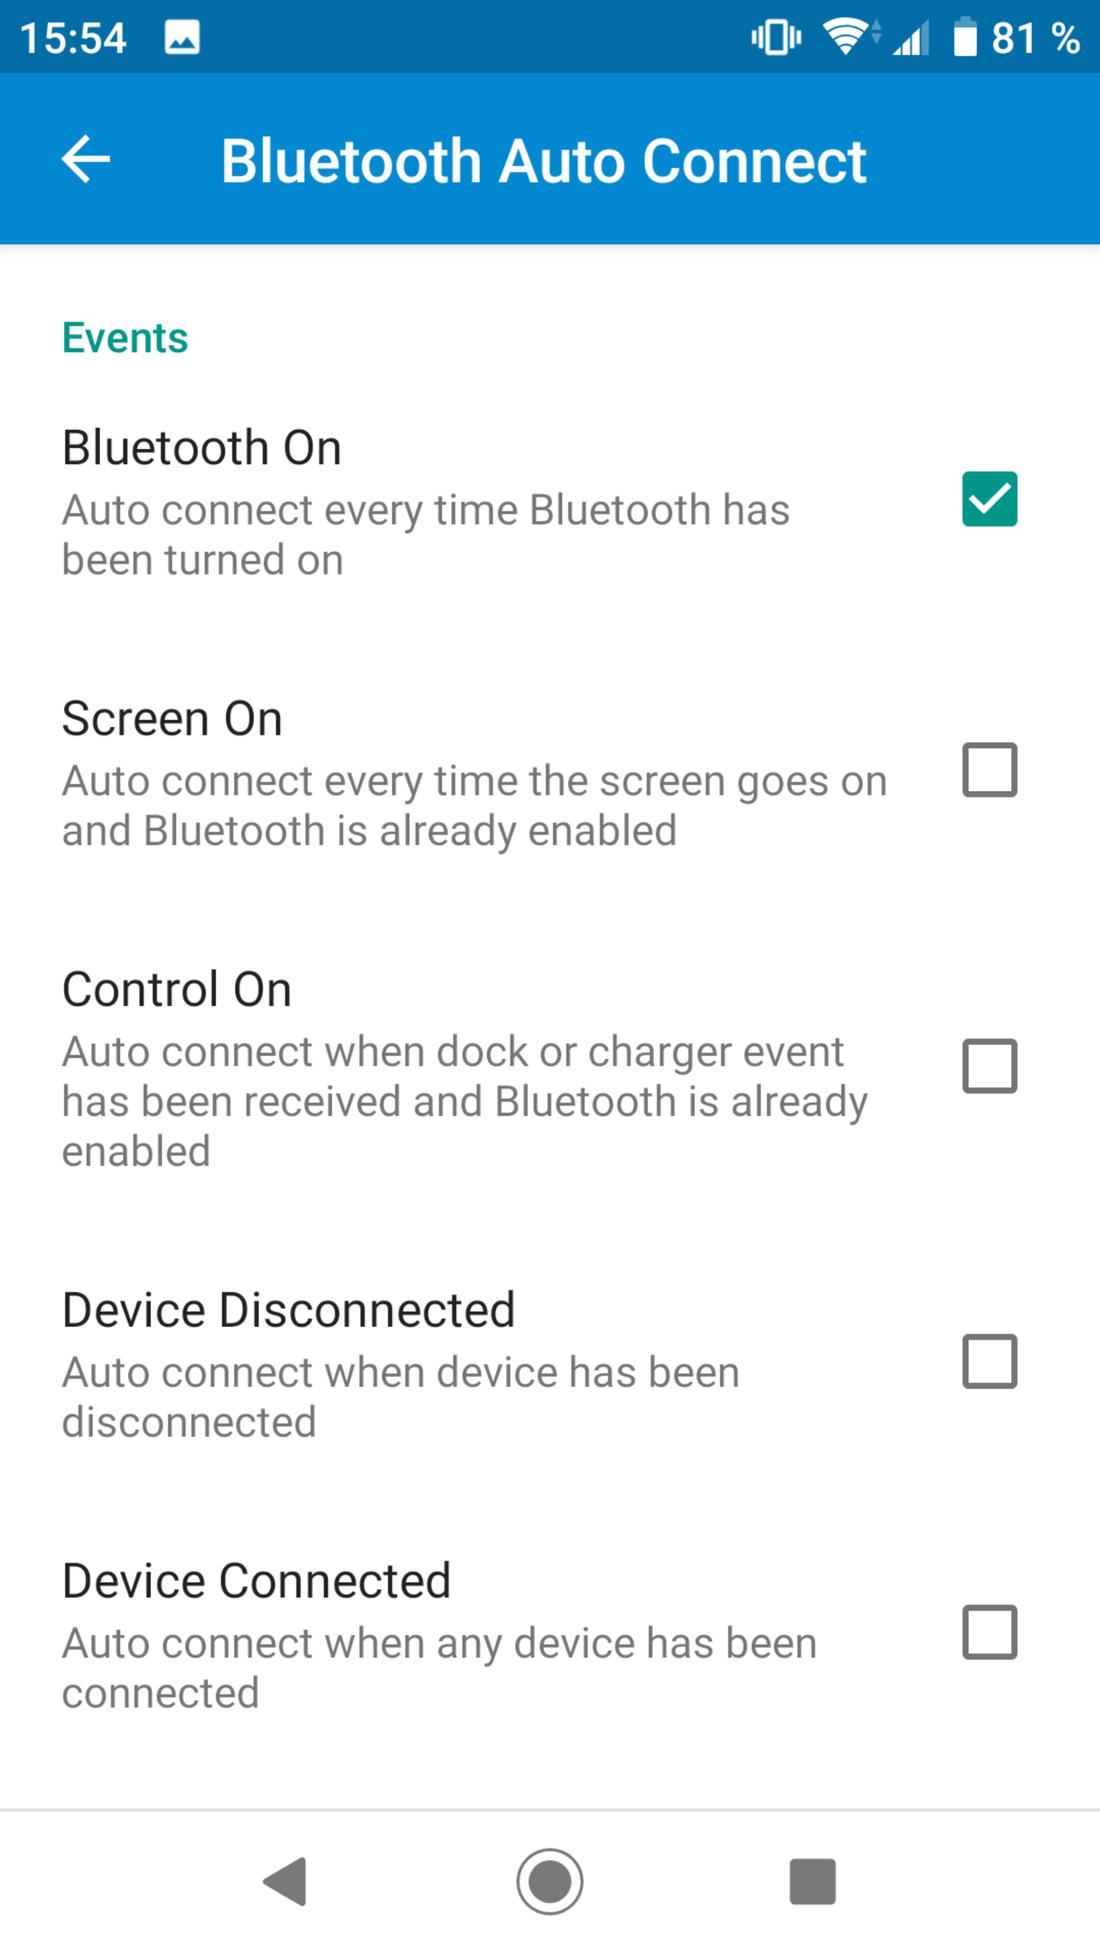 Скриншот #2 из программы Bluetooth Auto Connect